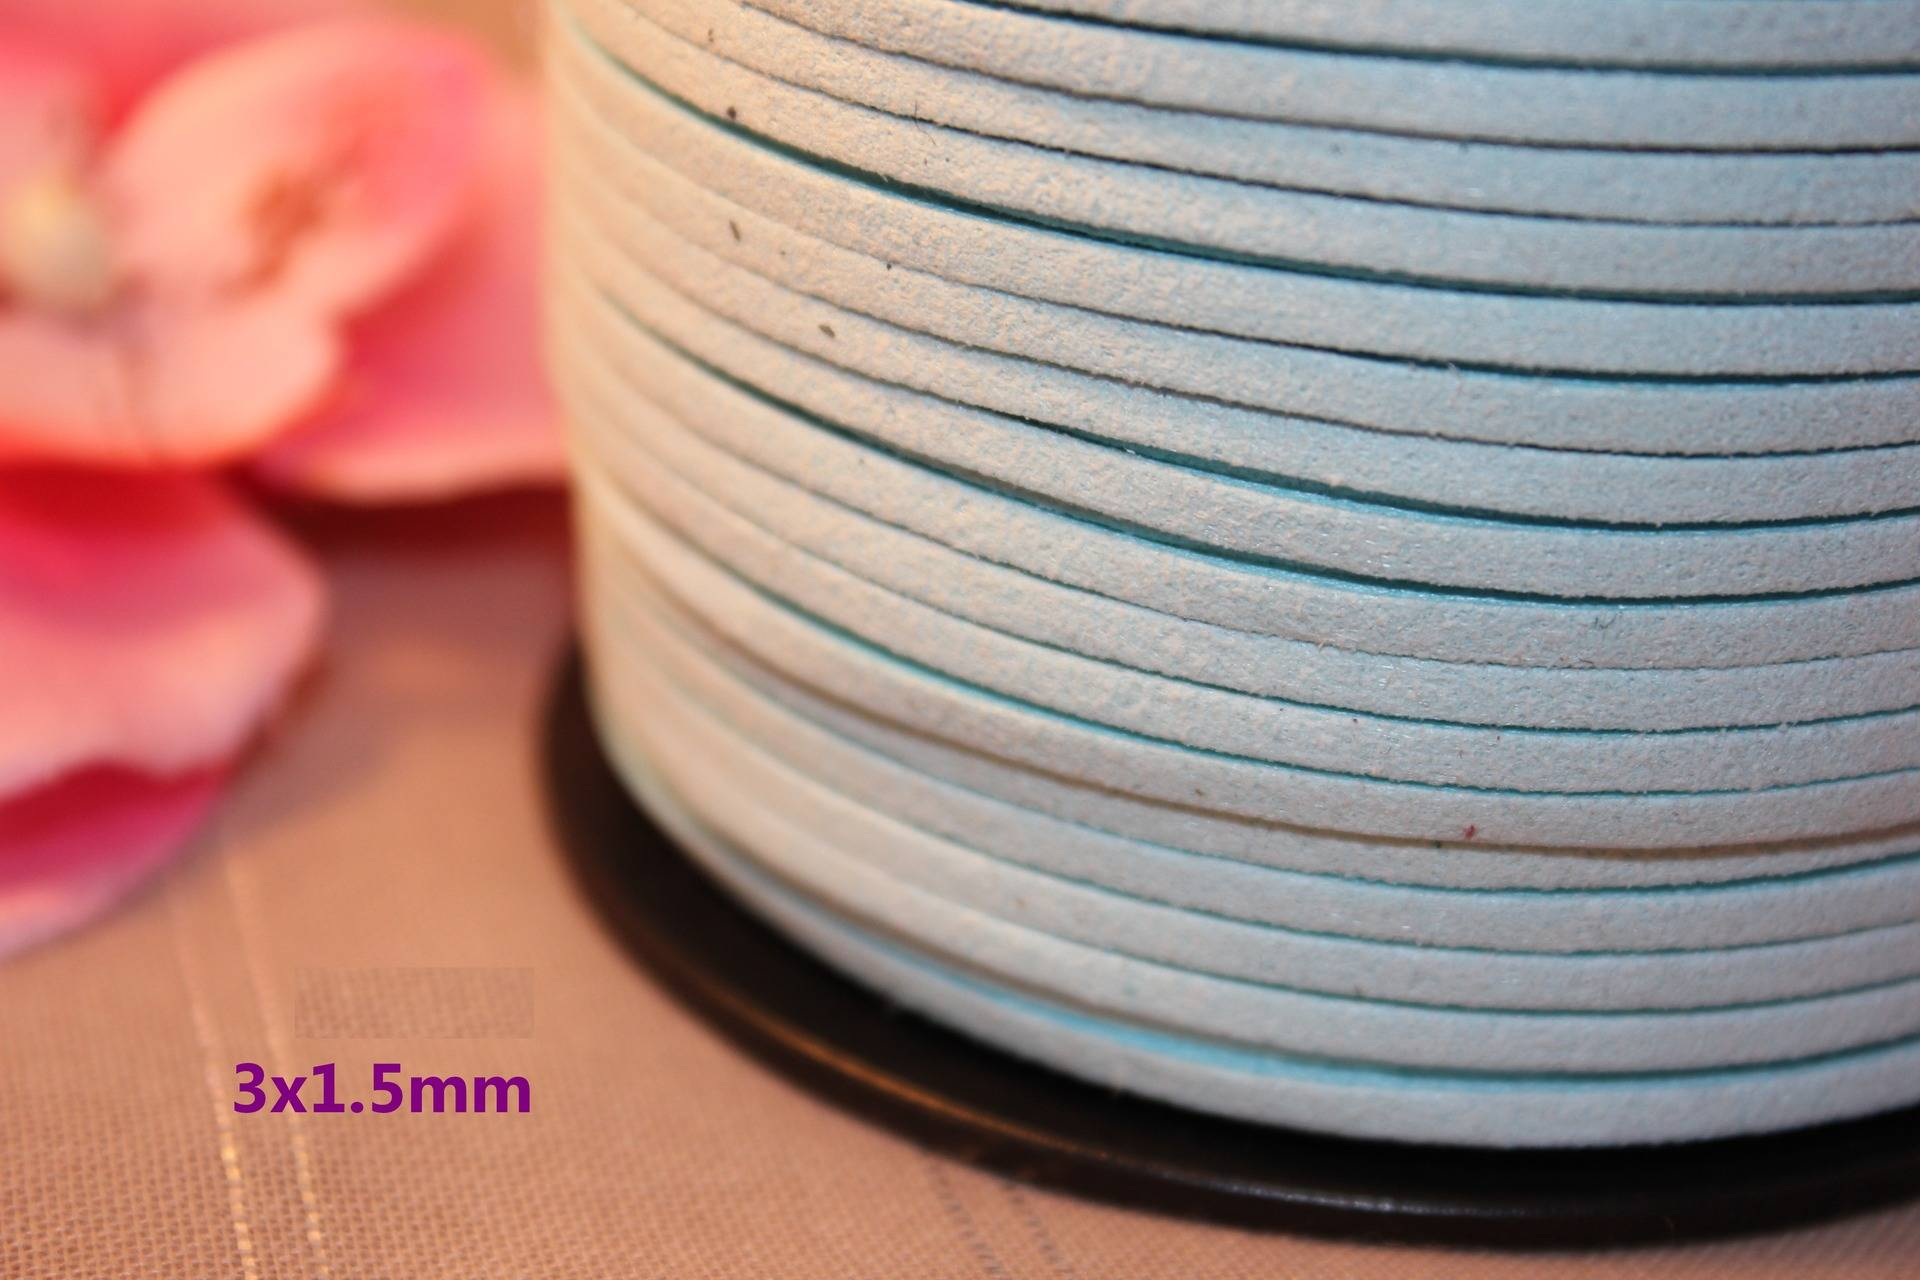 5m Ruban Cordon Suédine 3x1.5mm Bleu